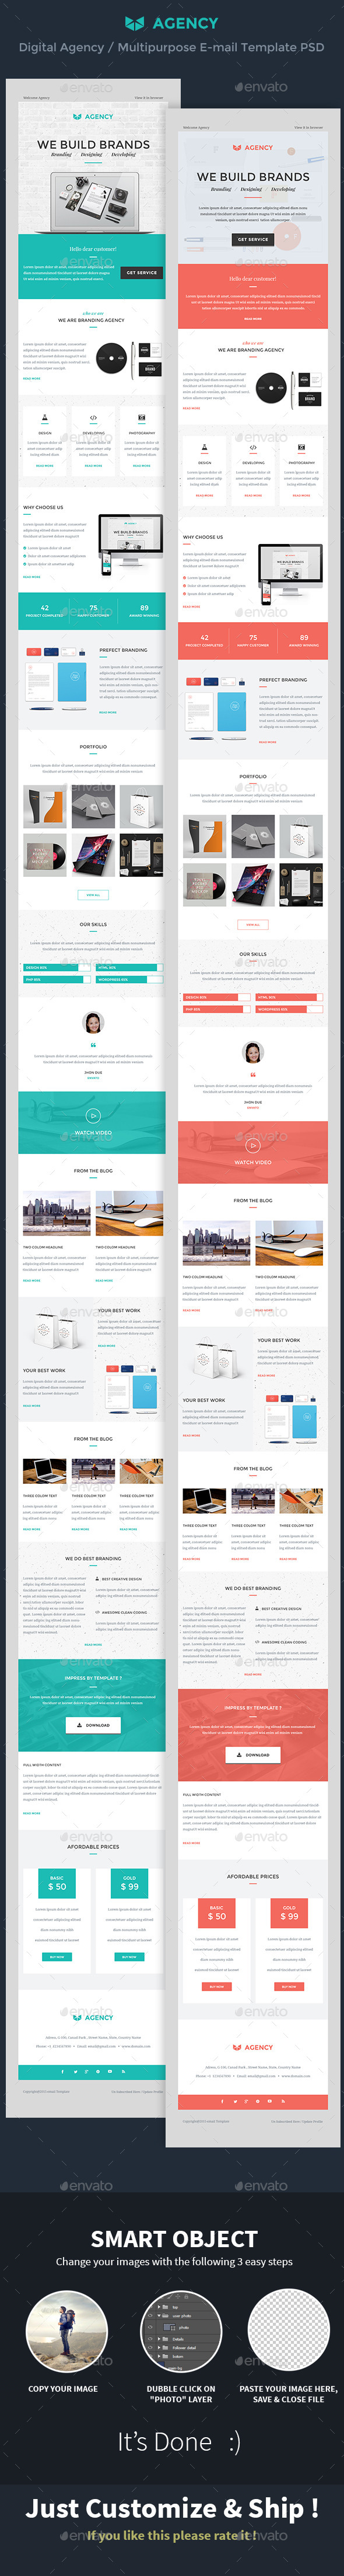 Digital Agency / Multipurpose E-mail Template PSD - E-newsletters Web Elements